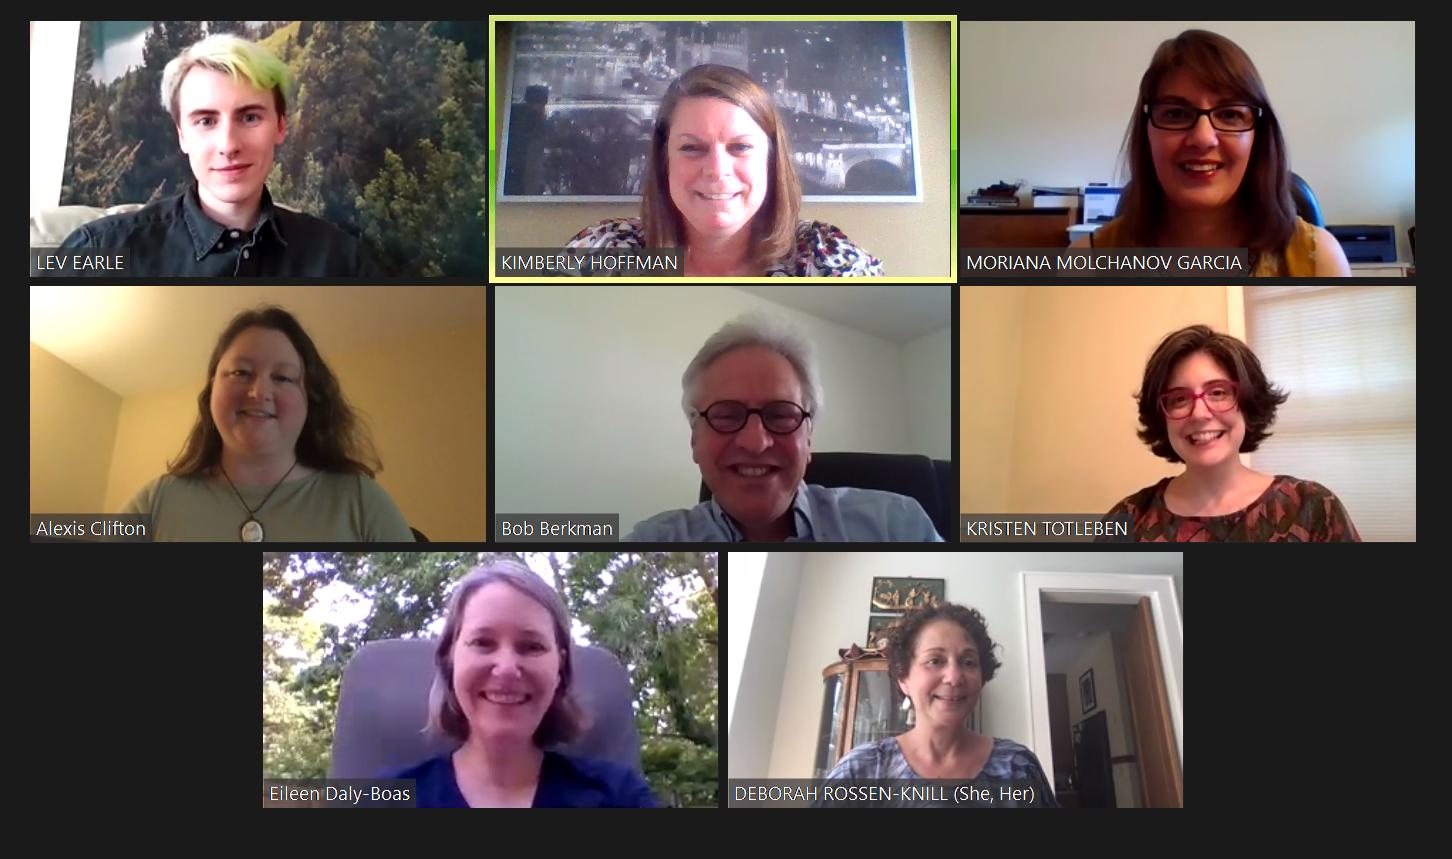 Zoom screenshot of Lev, Kimberly, Moriana, Alexis, Robert, Kristen, Eileen, and Deborah